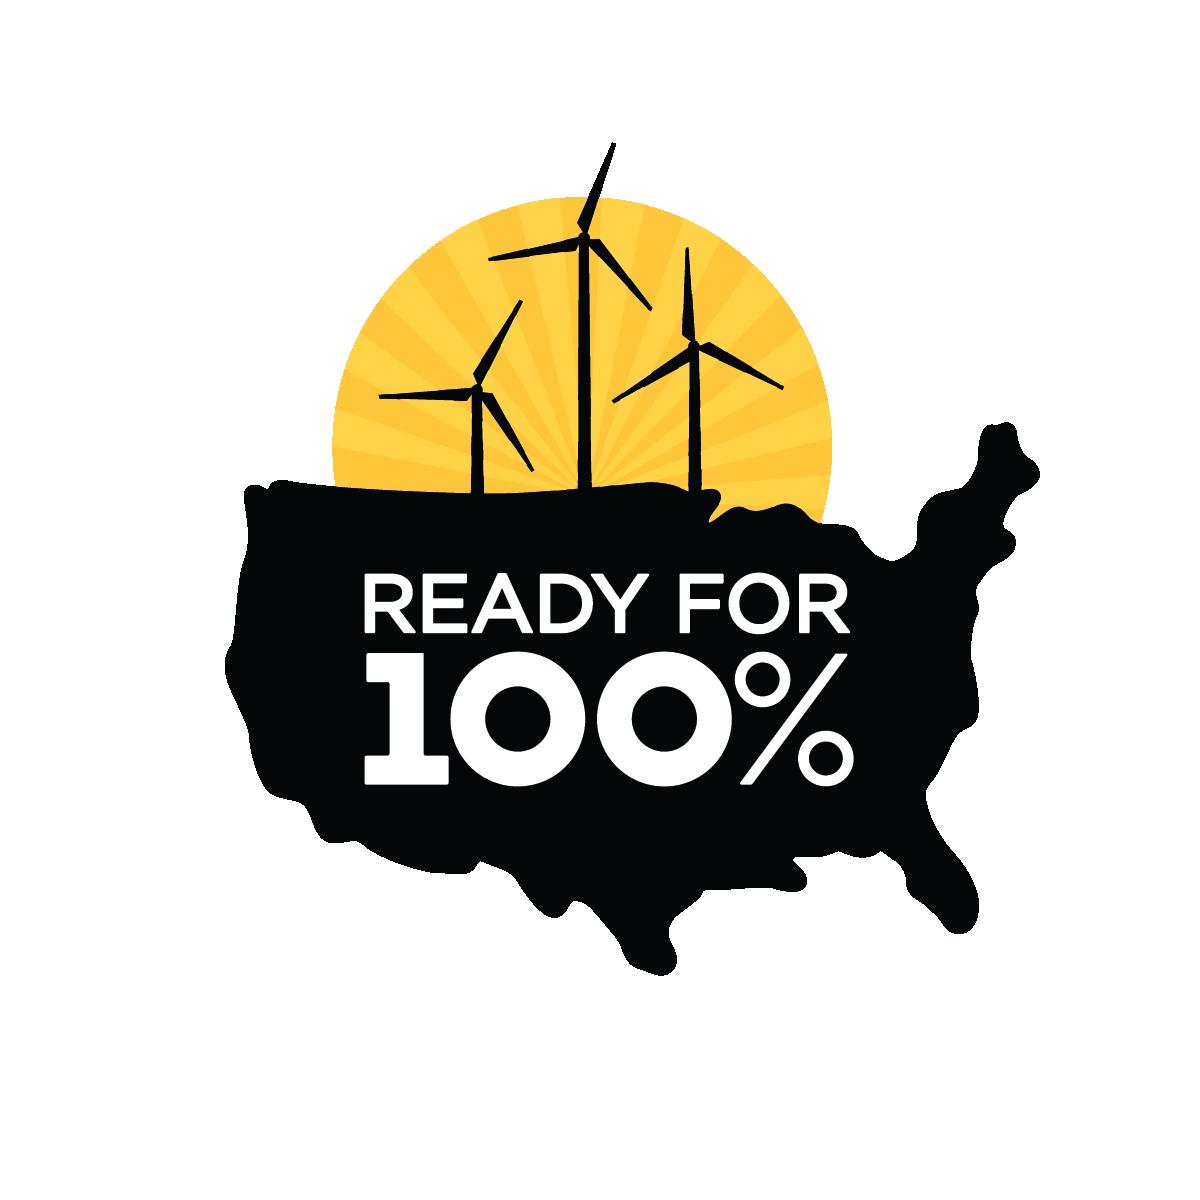 Sierra Club's Ready for 100 Campaign